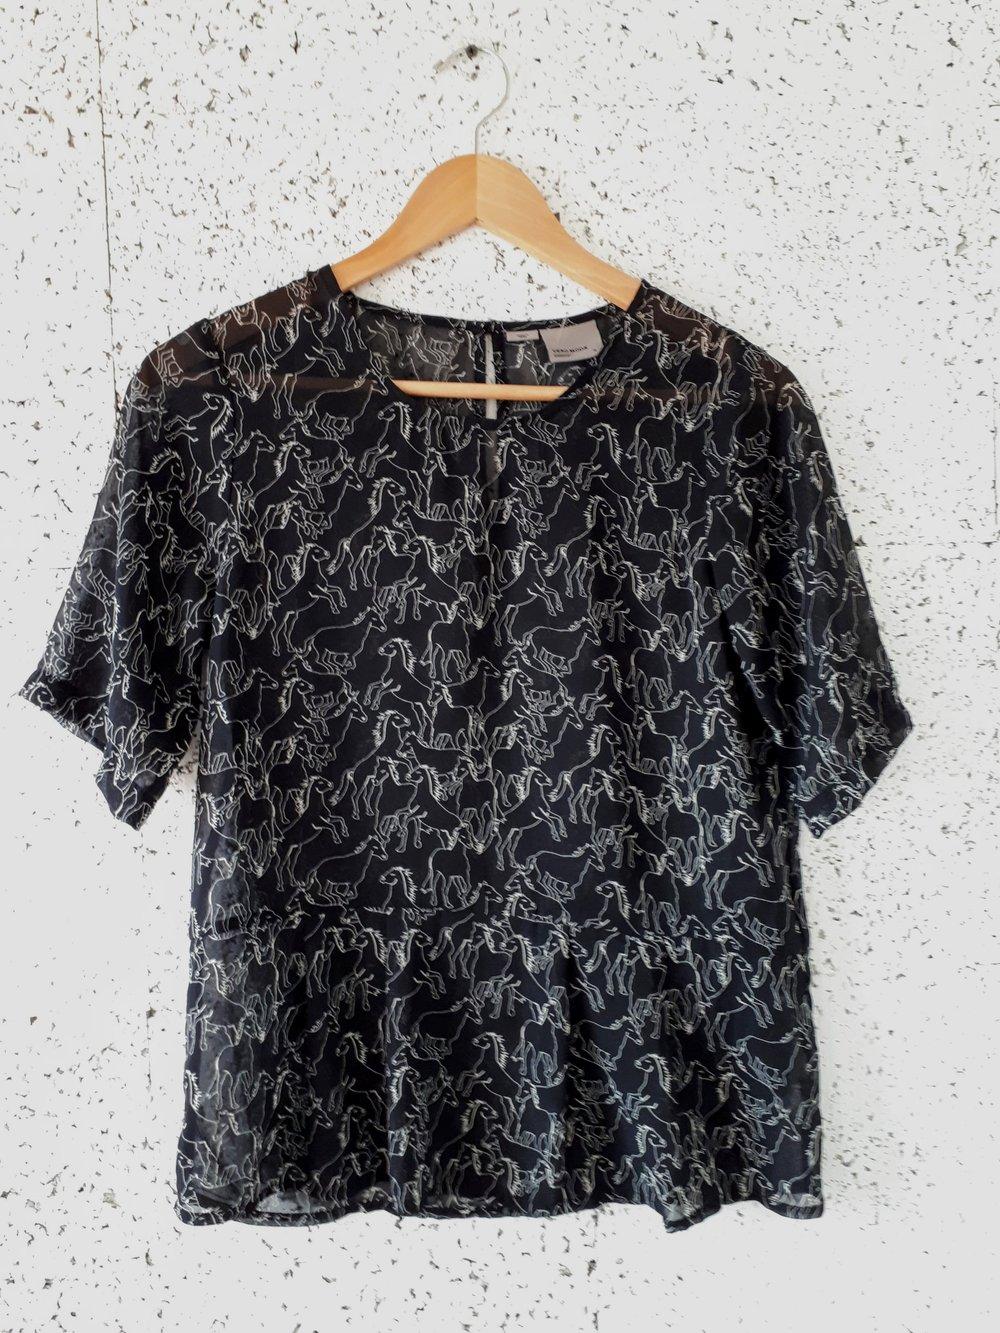 Vero Moda top; Size M, $28